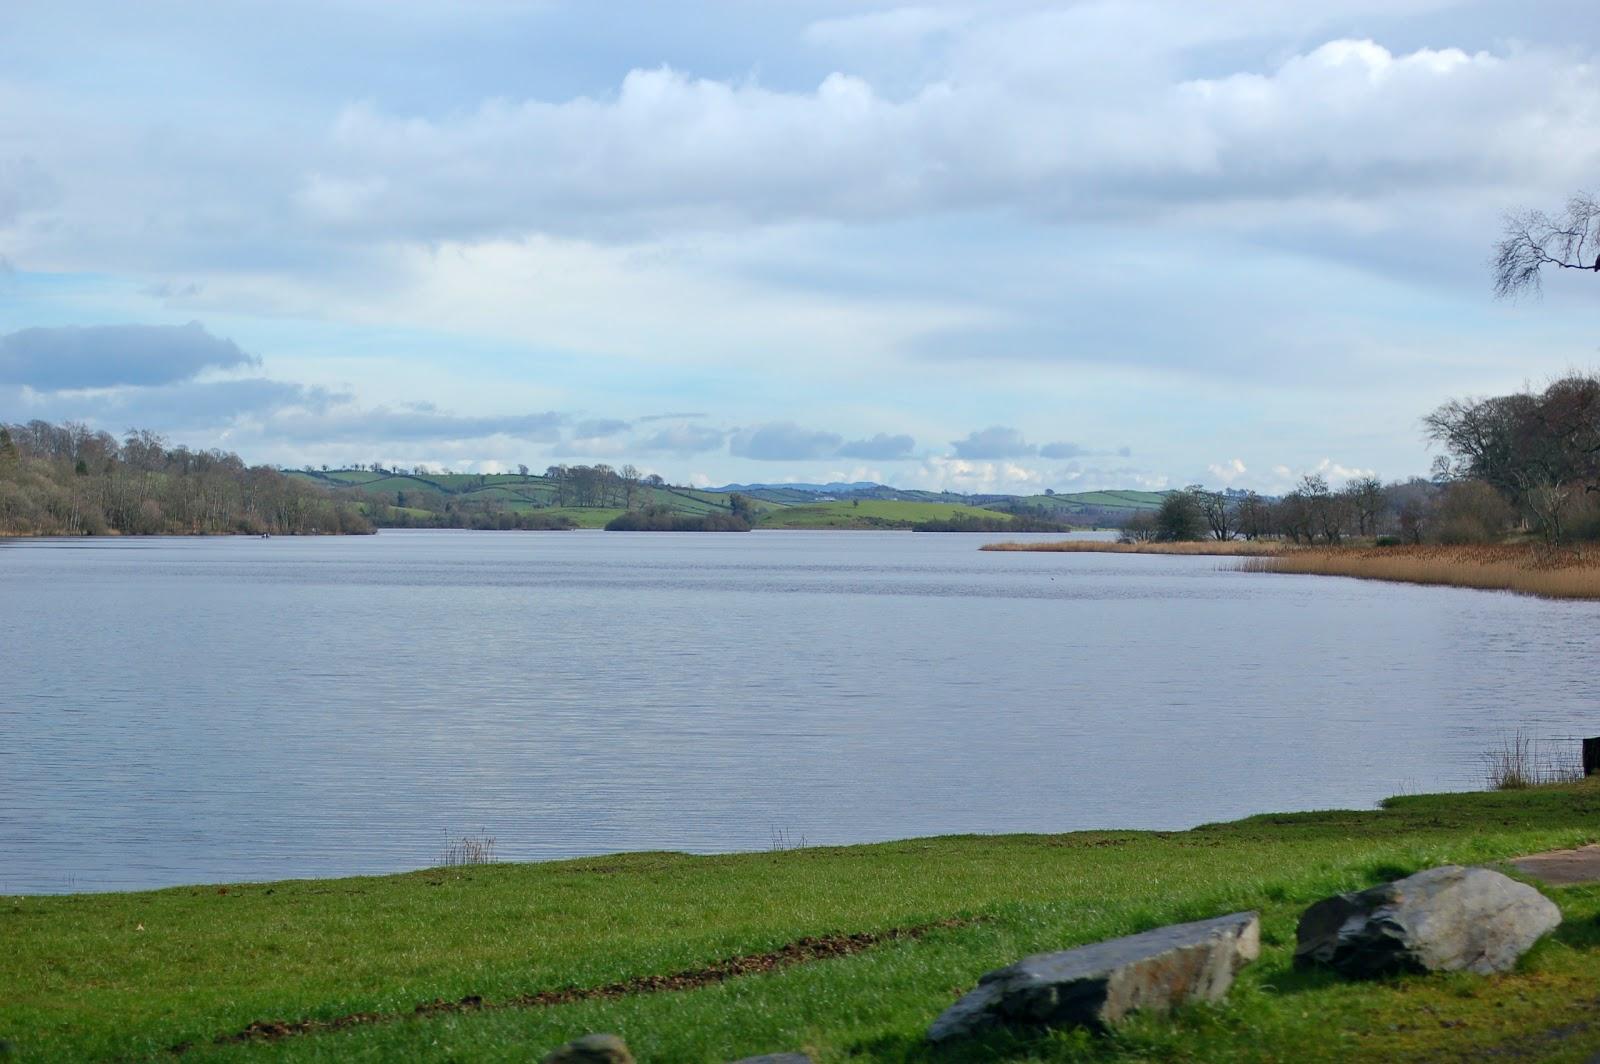 lake muckno, castleblayney, county monaghan, ireland